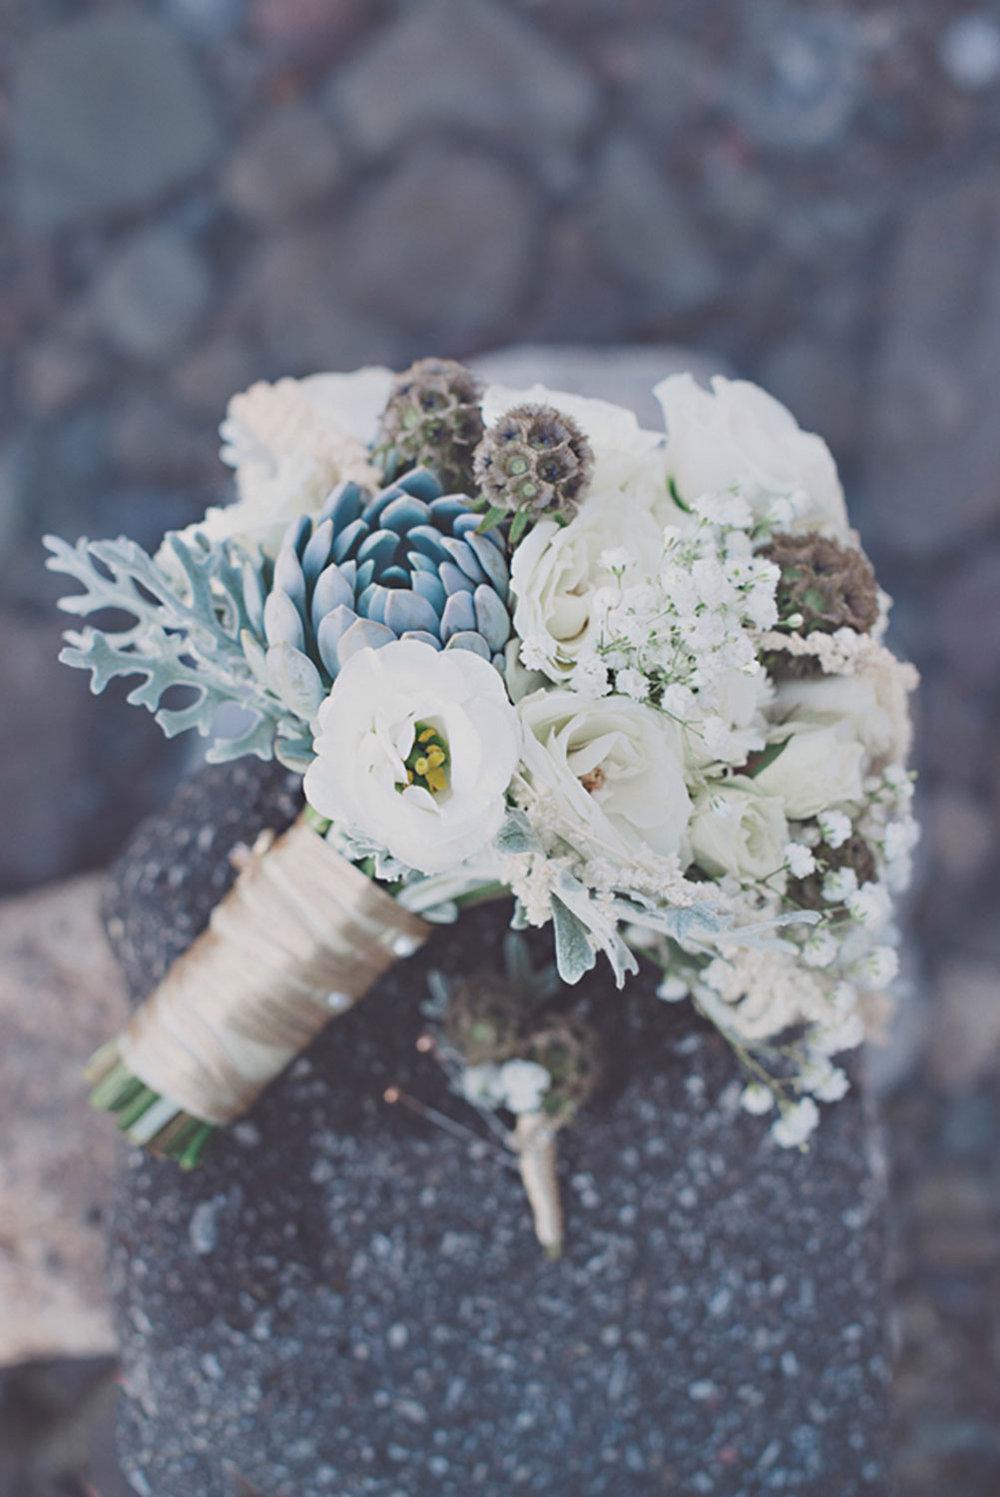 Grimbsy-Beach-Editorial-Vineyard-Bride-photo-by-Destiny-Dawn-Photography-003.JPG